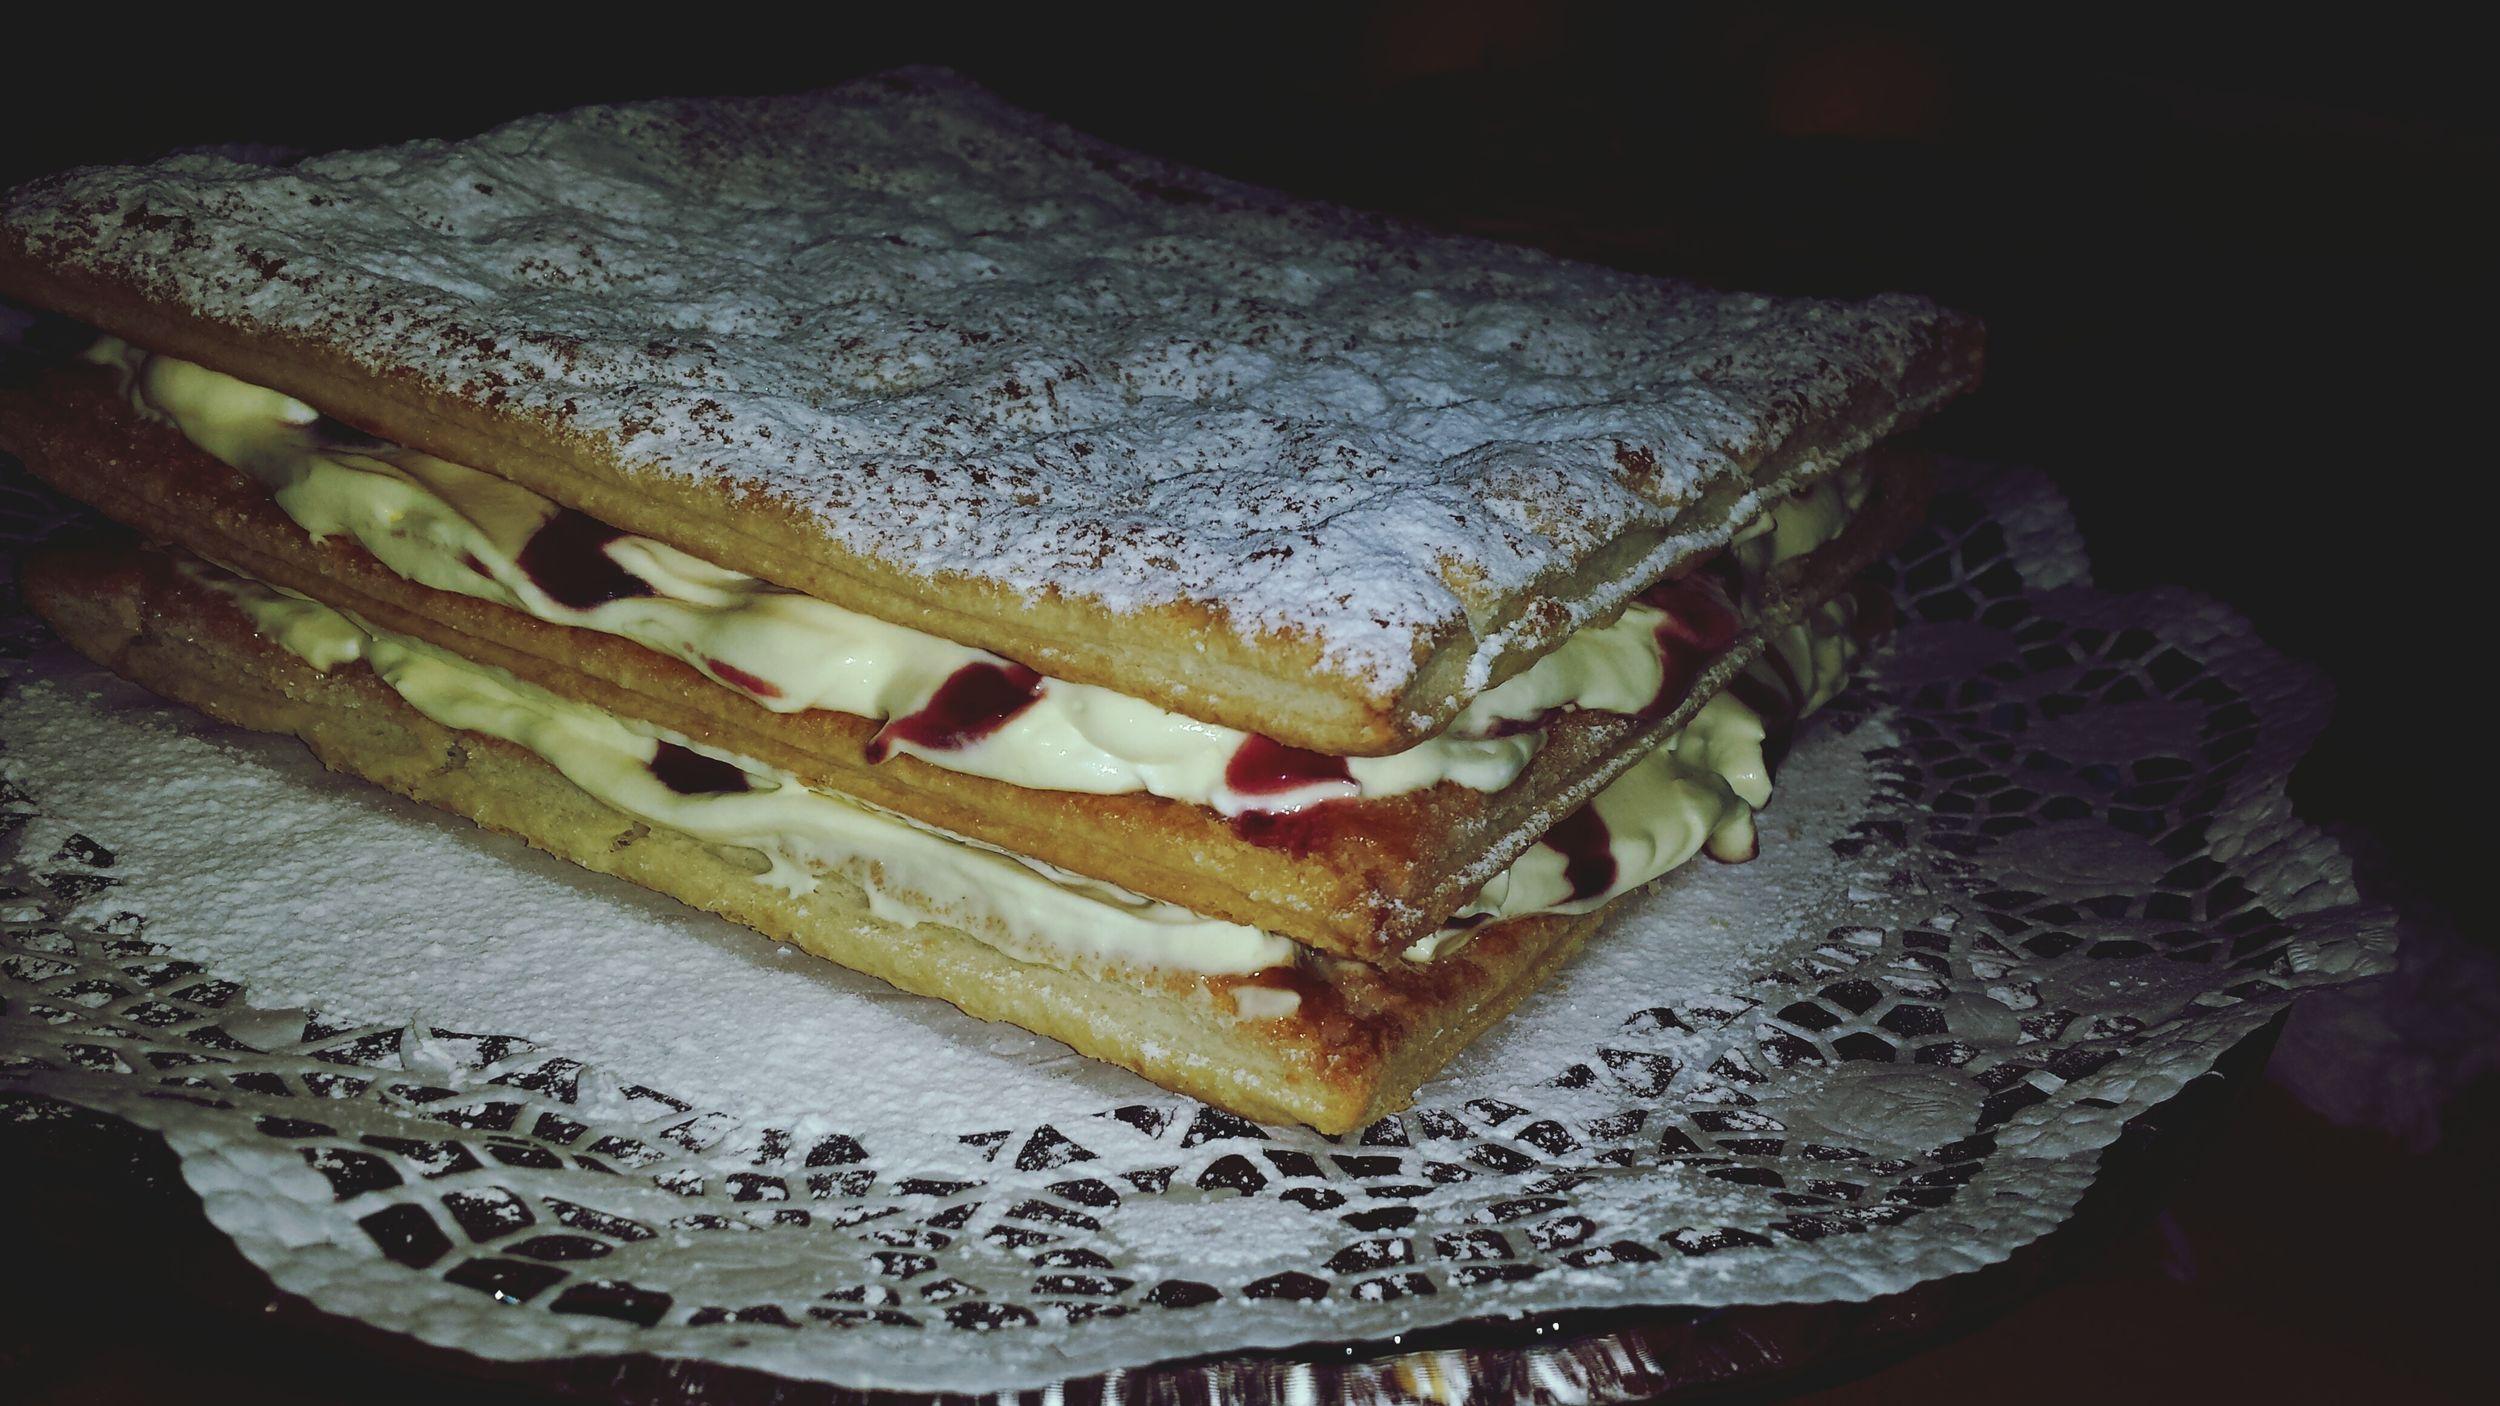 Cake millefoglie Torta Tortamillefoglie Pomeriggicostruttivi Pomeriggiocreativo Cake Cake Cake Cake  Cakelovers Cake Time Pasticciando Tortamodeon